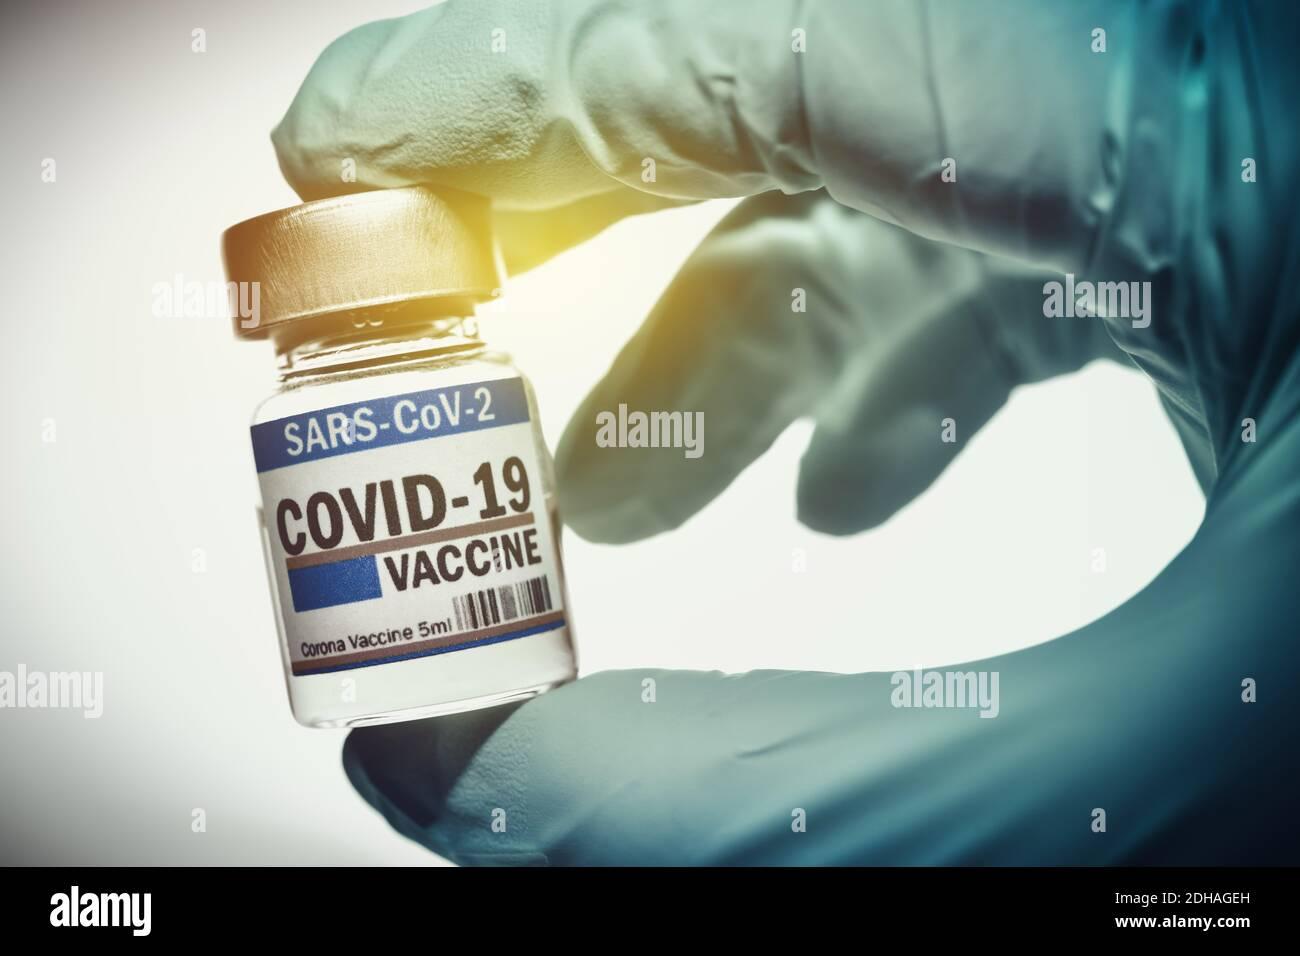 Hand im Latexhandschuh hält Injektionsfläschchen mit Corona-Impfstoff, Symbolfoto Corona-Impfmittel Stock Photo